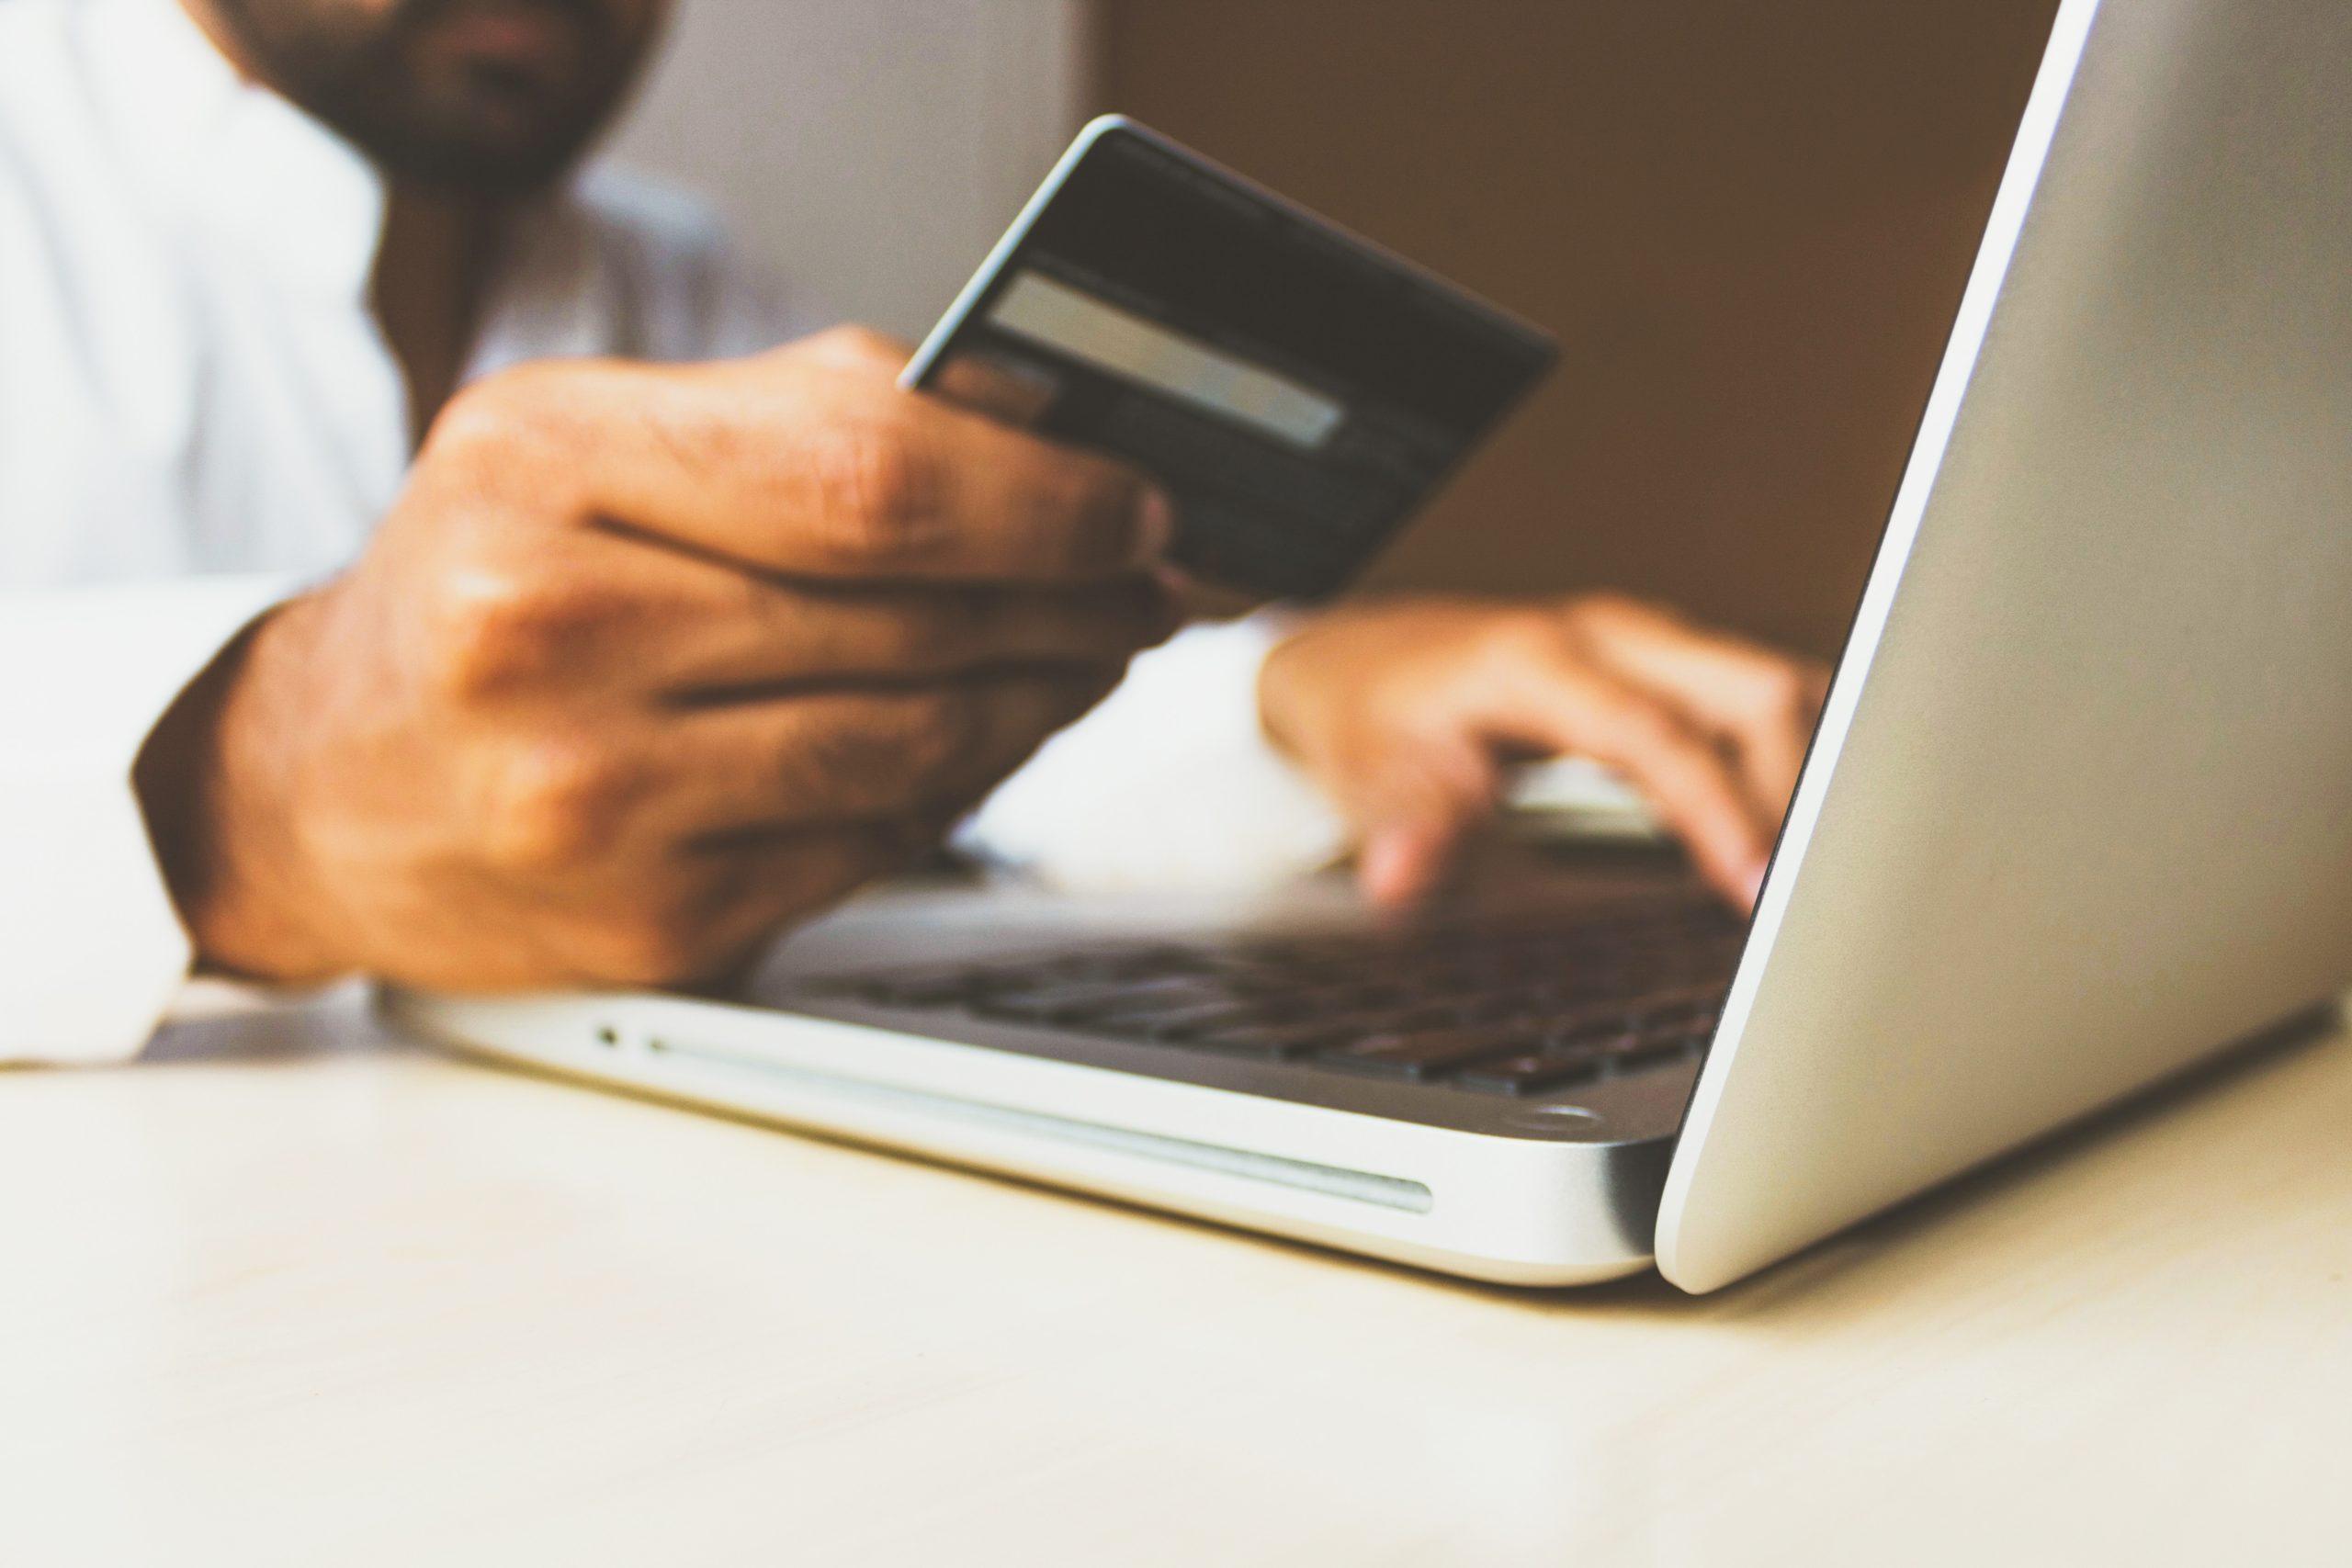 Halifax credit card